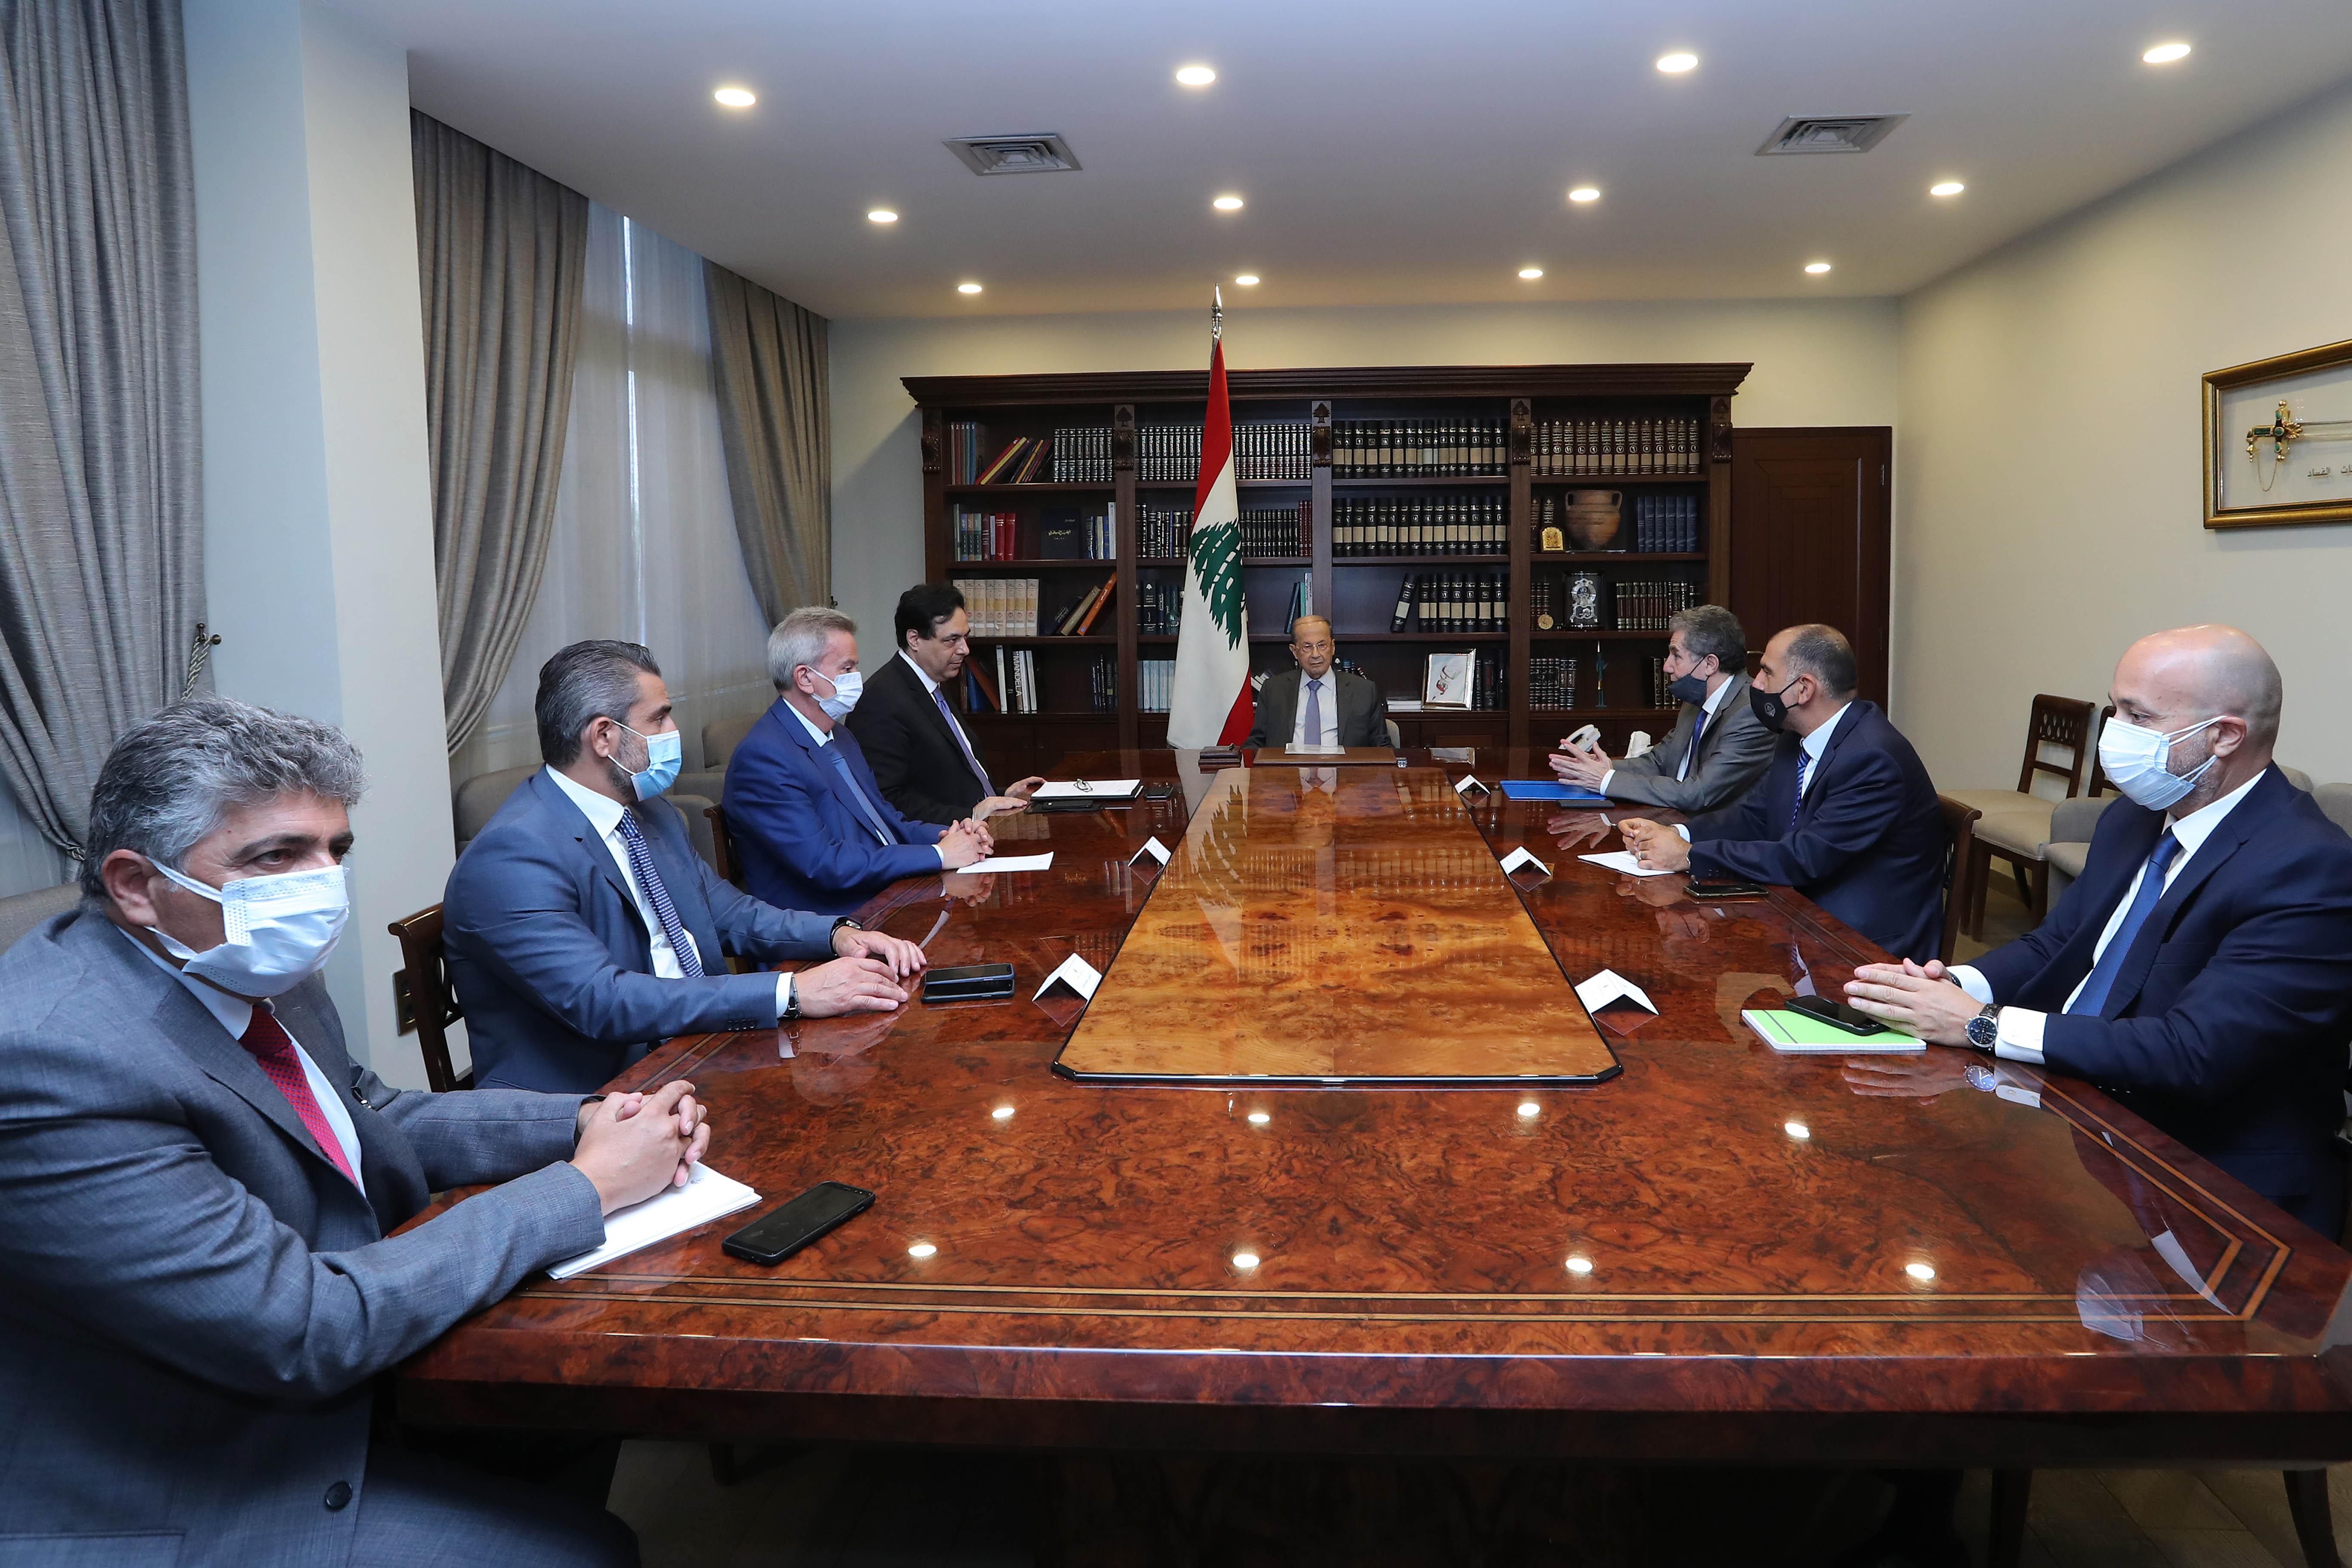 3 - Prime Minister Hassan Diab